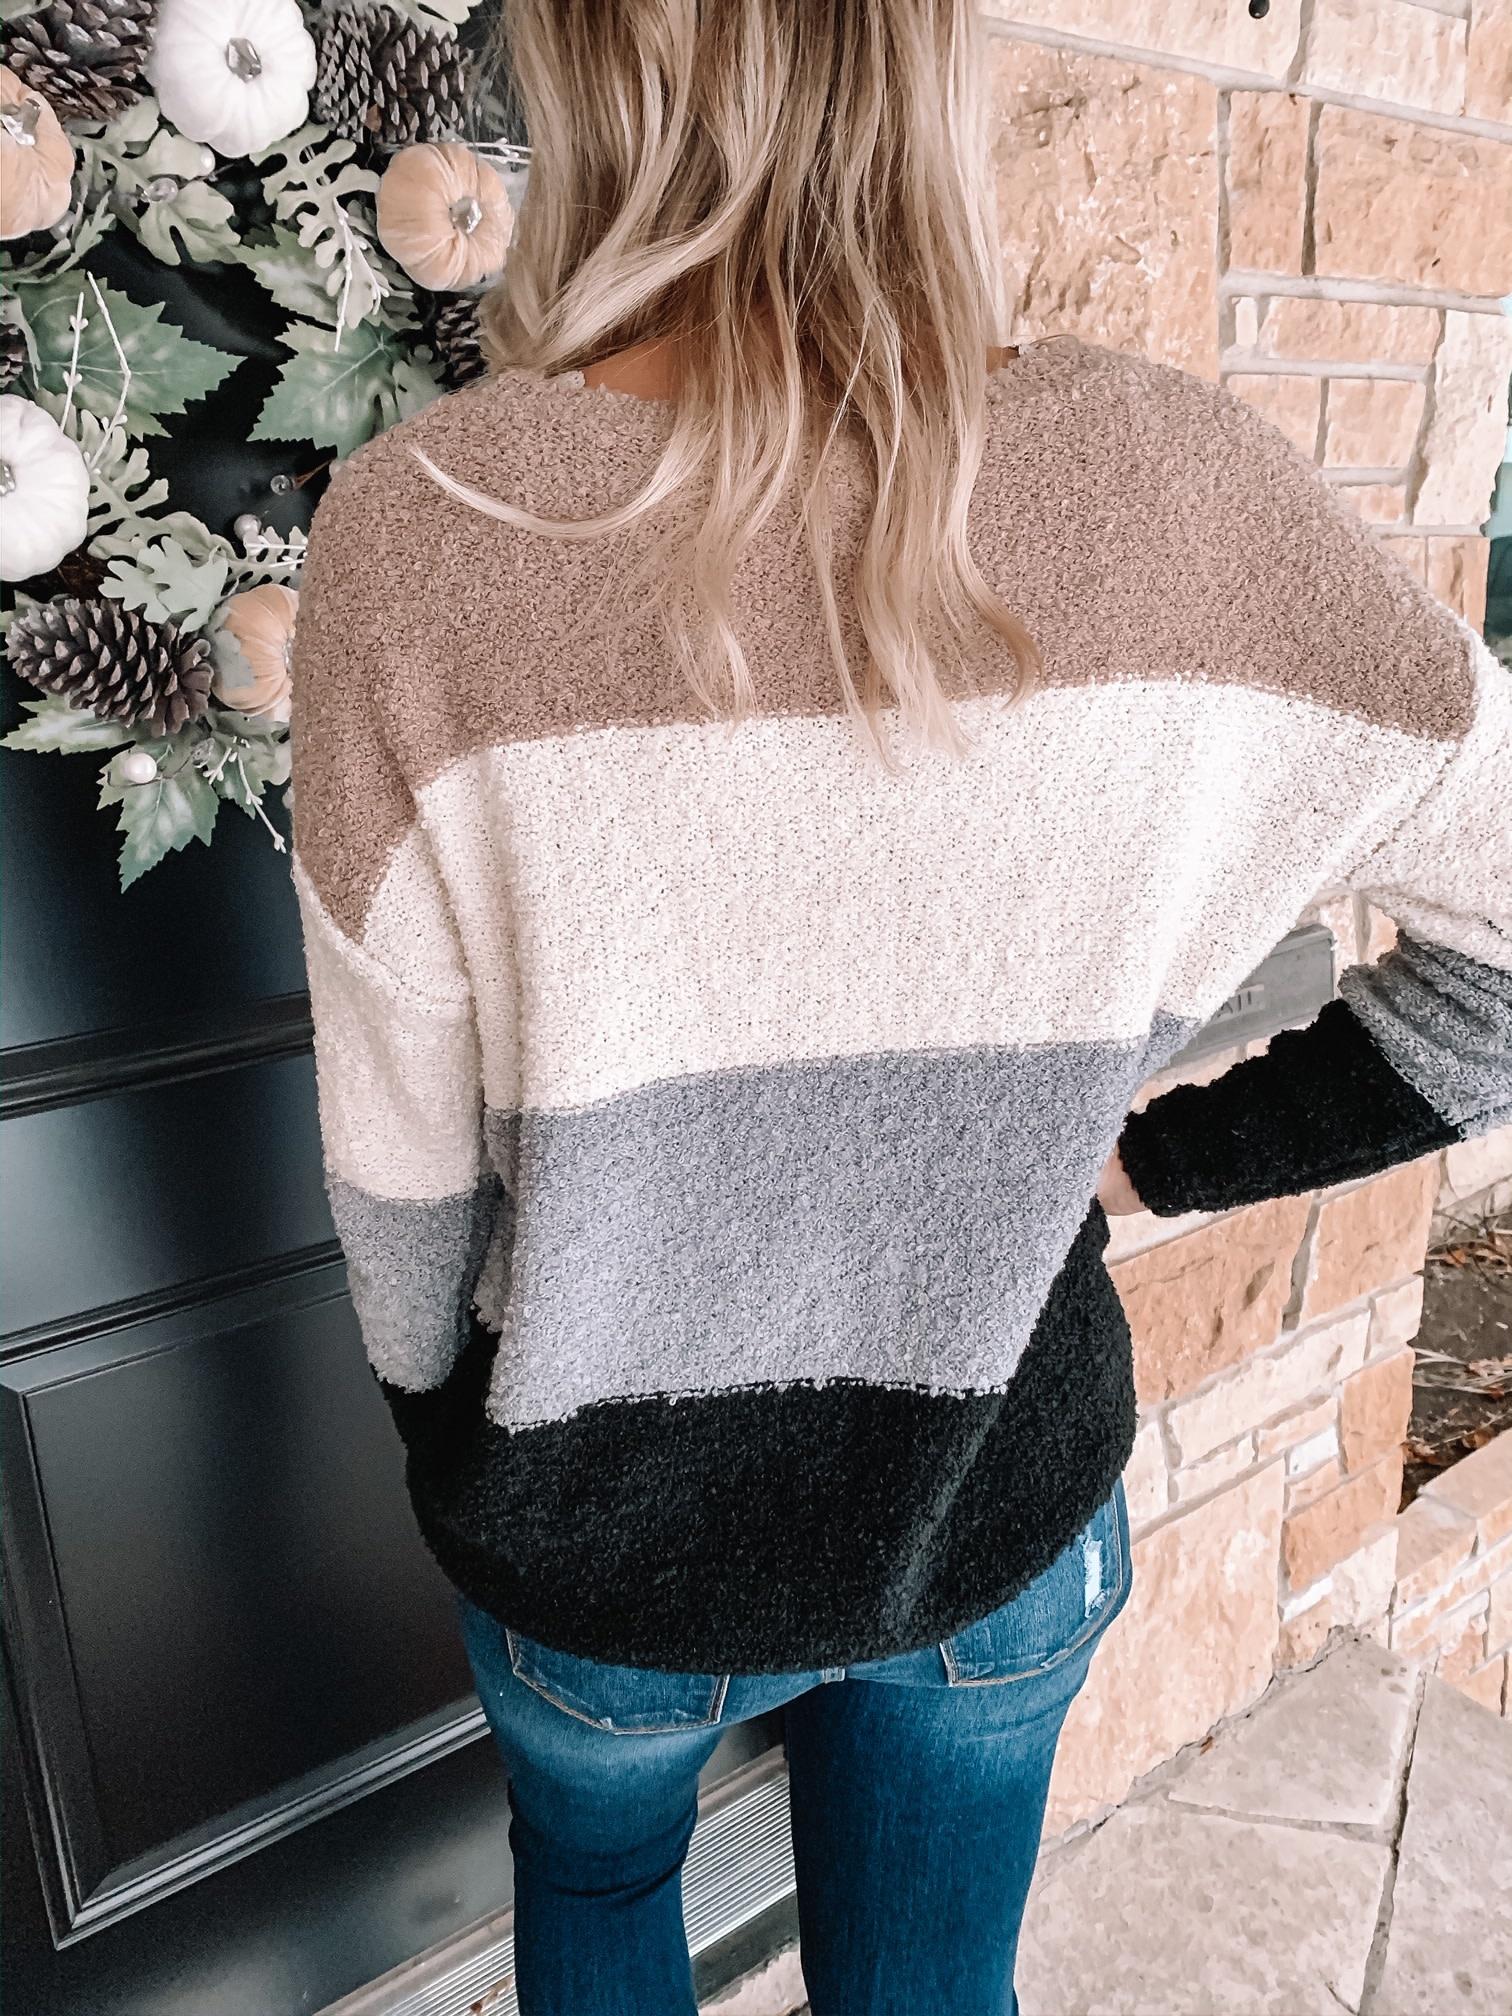 Alexis Black Colorblock Sweater